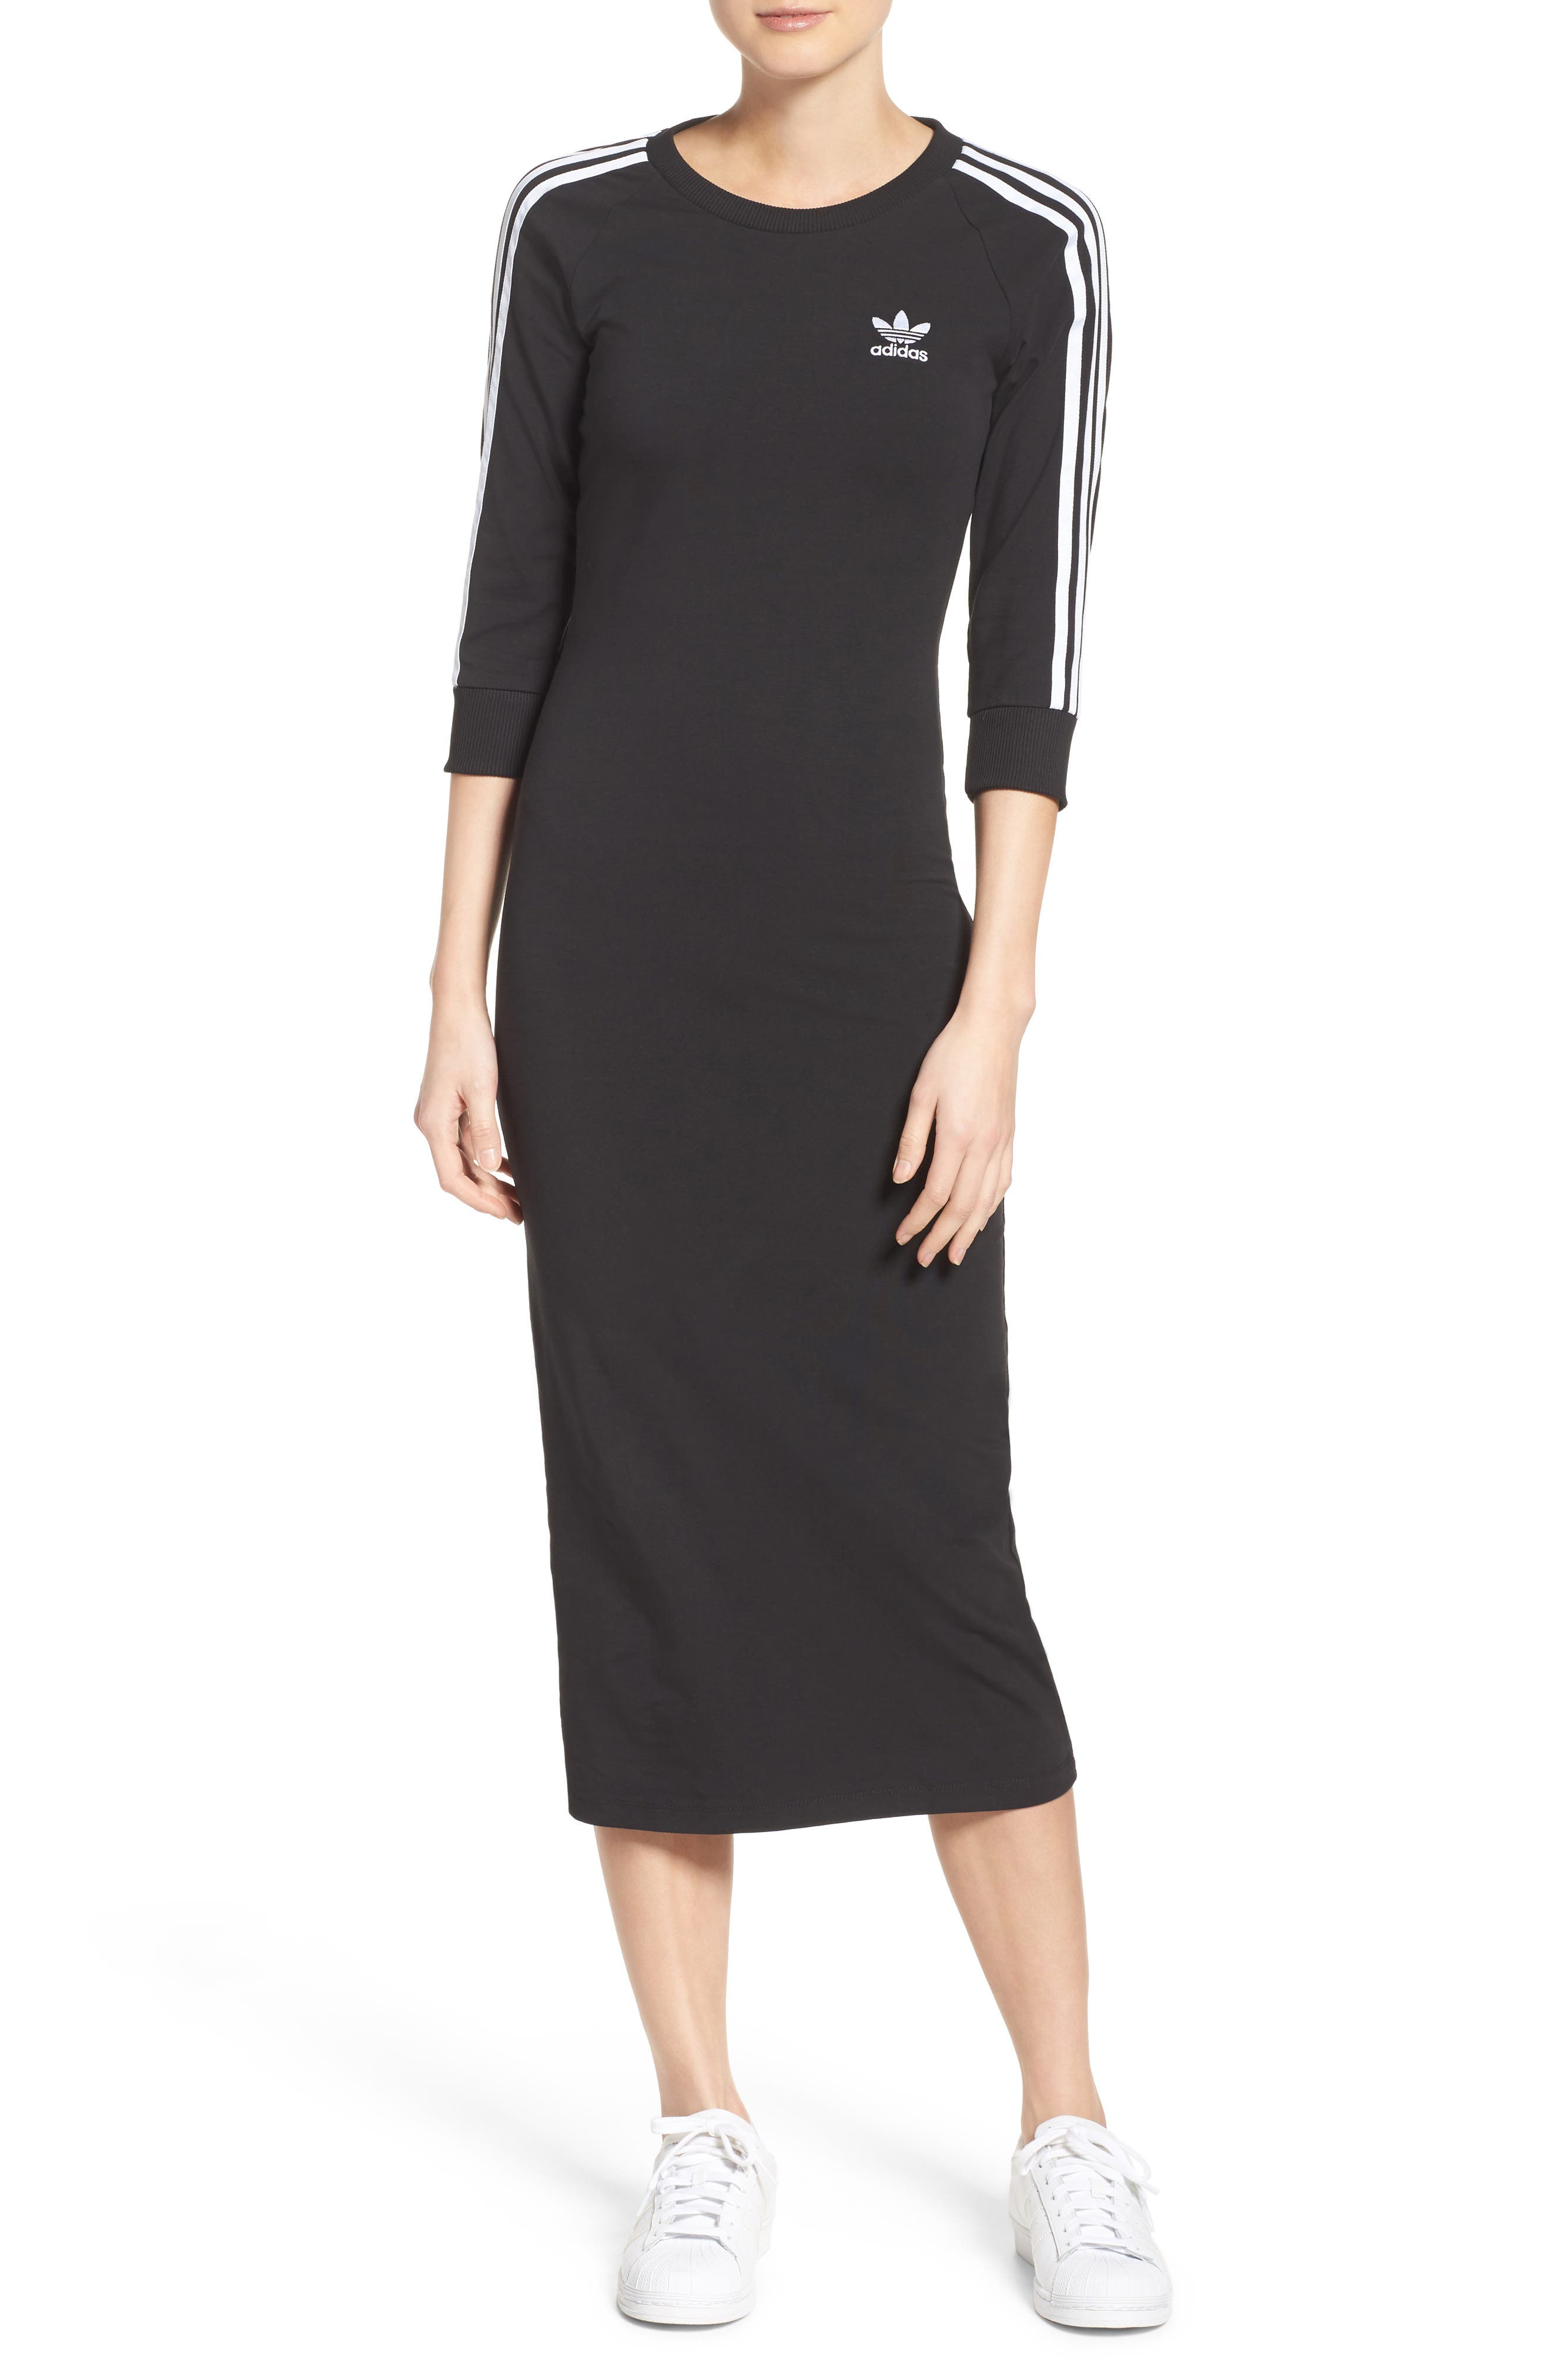 Originals 3-Stripes Dress,                         Main,                         color, Black